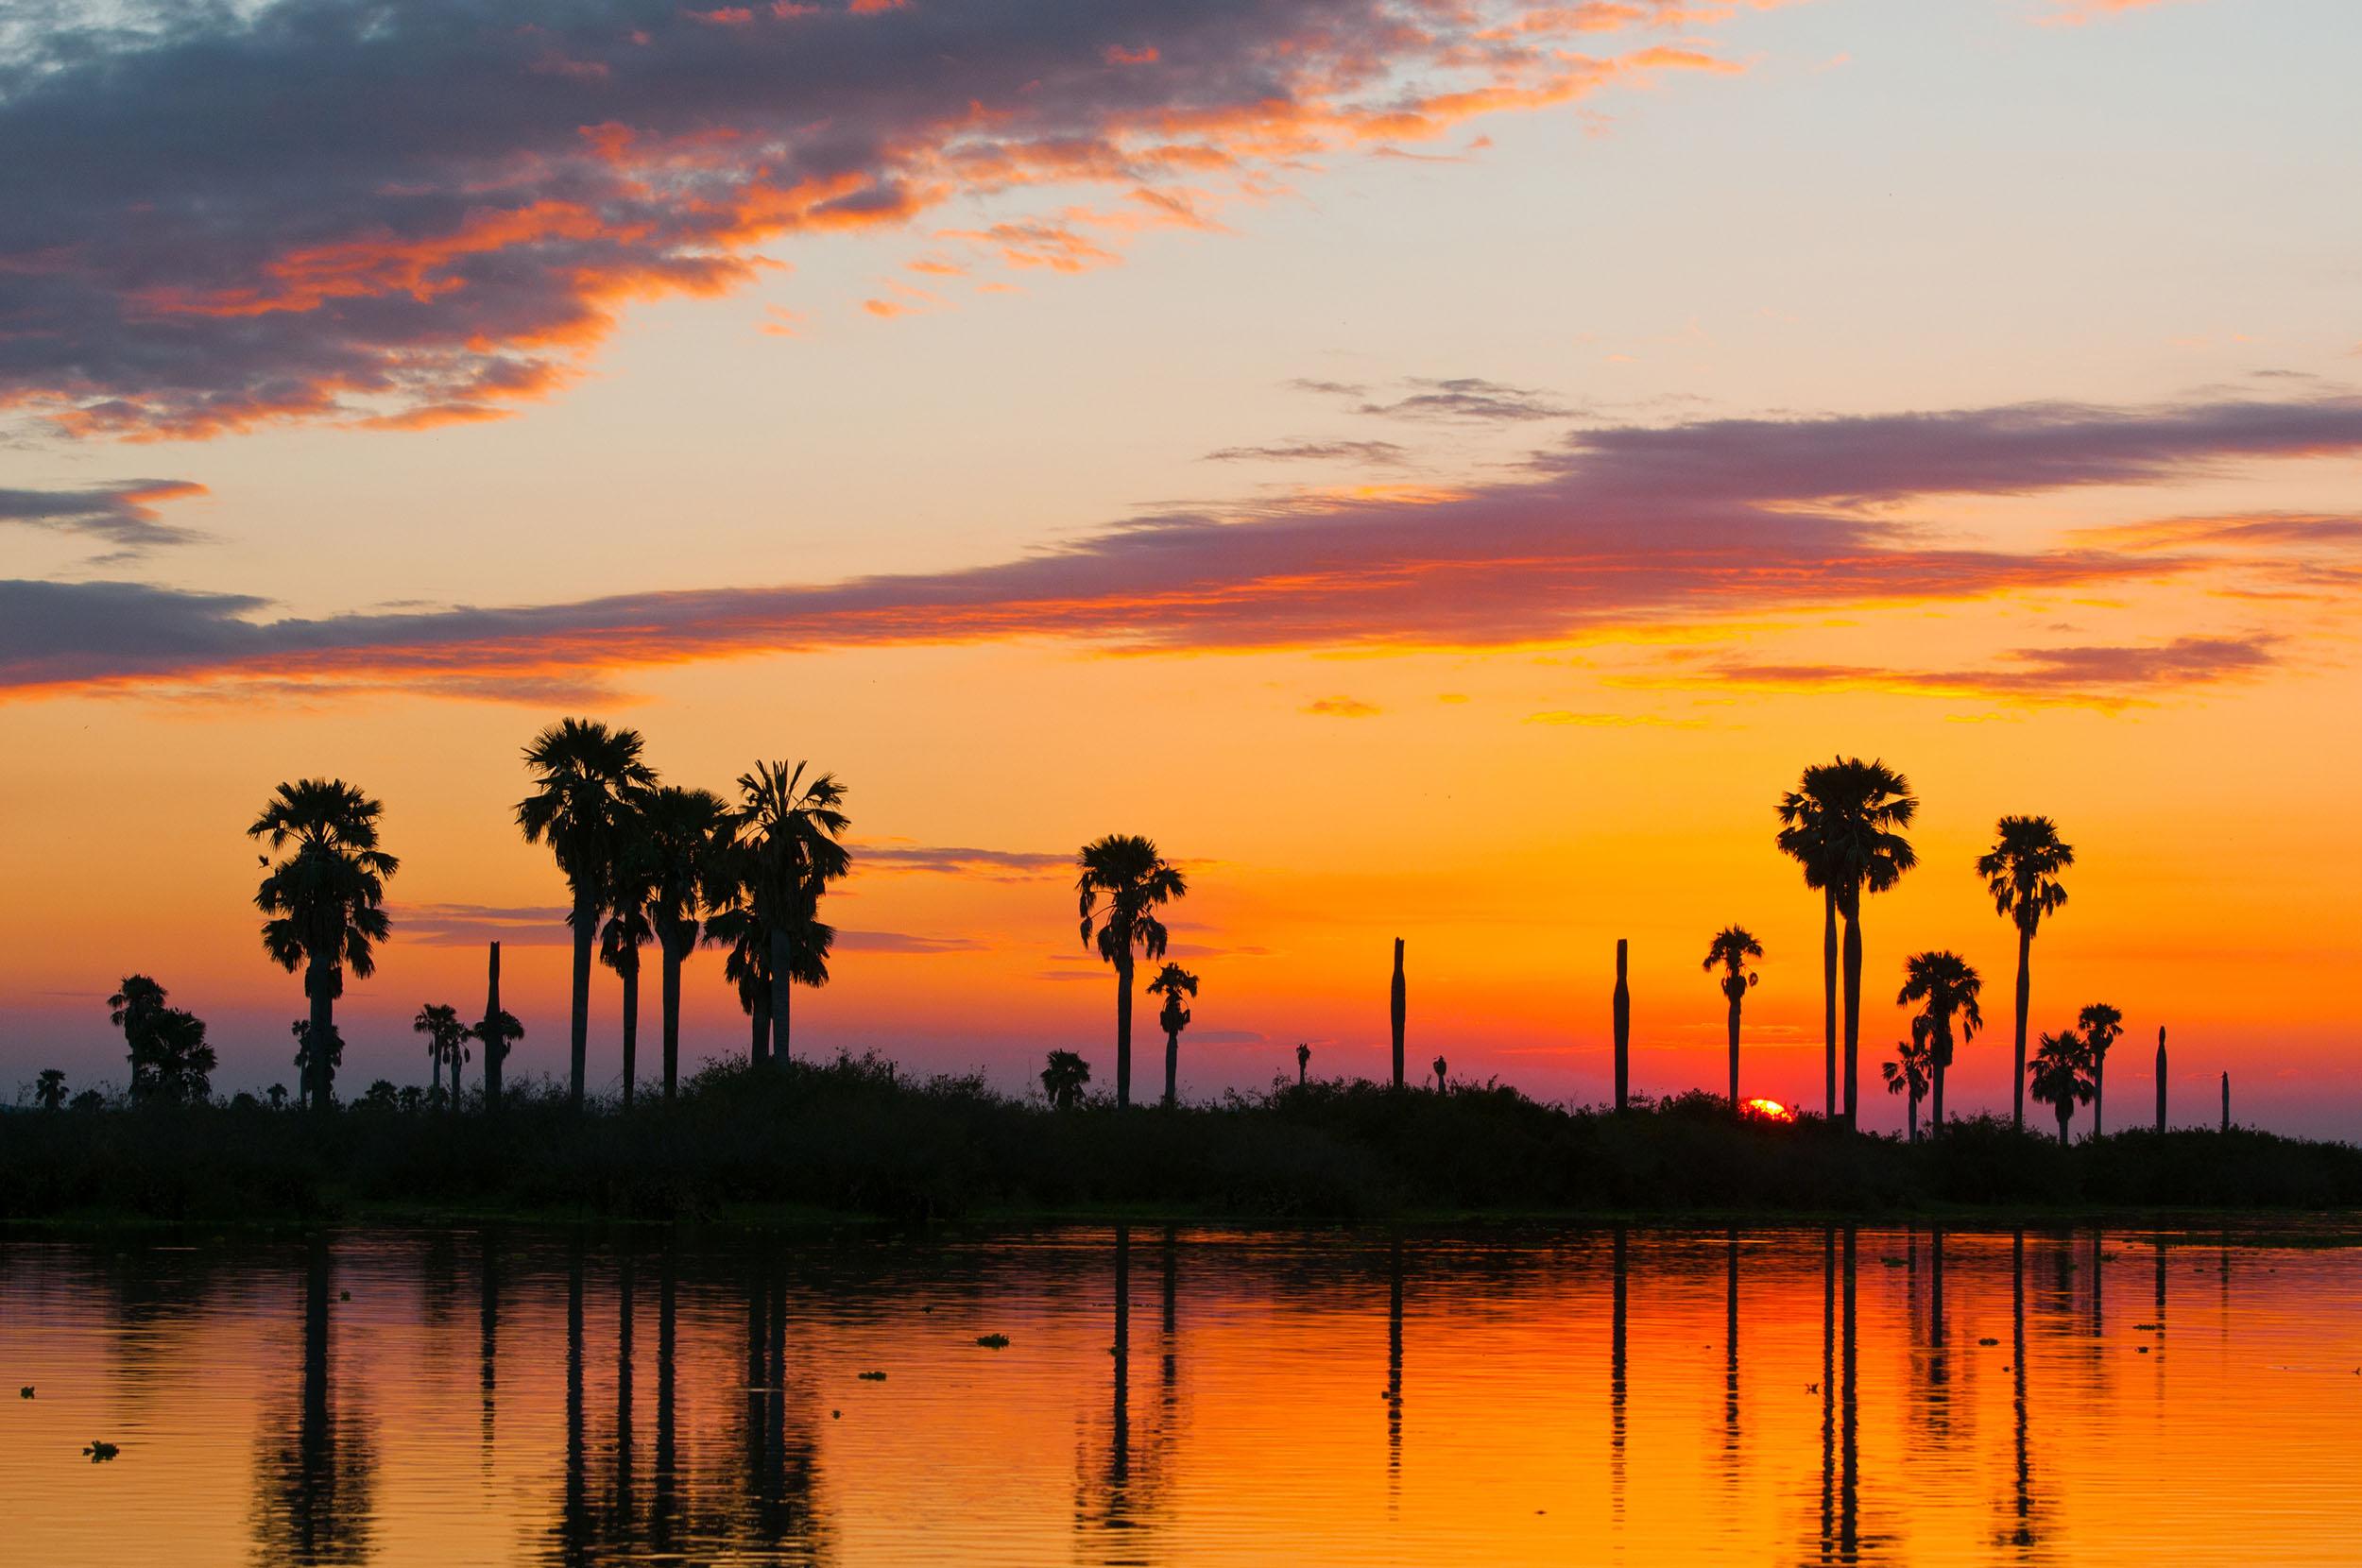 Tanzania nyerere national park sunset palm trees rufiji river